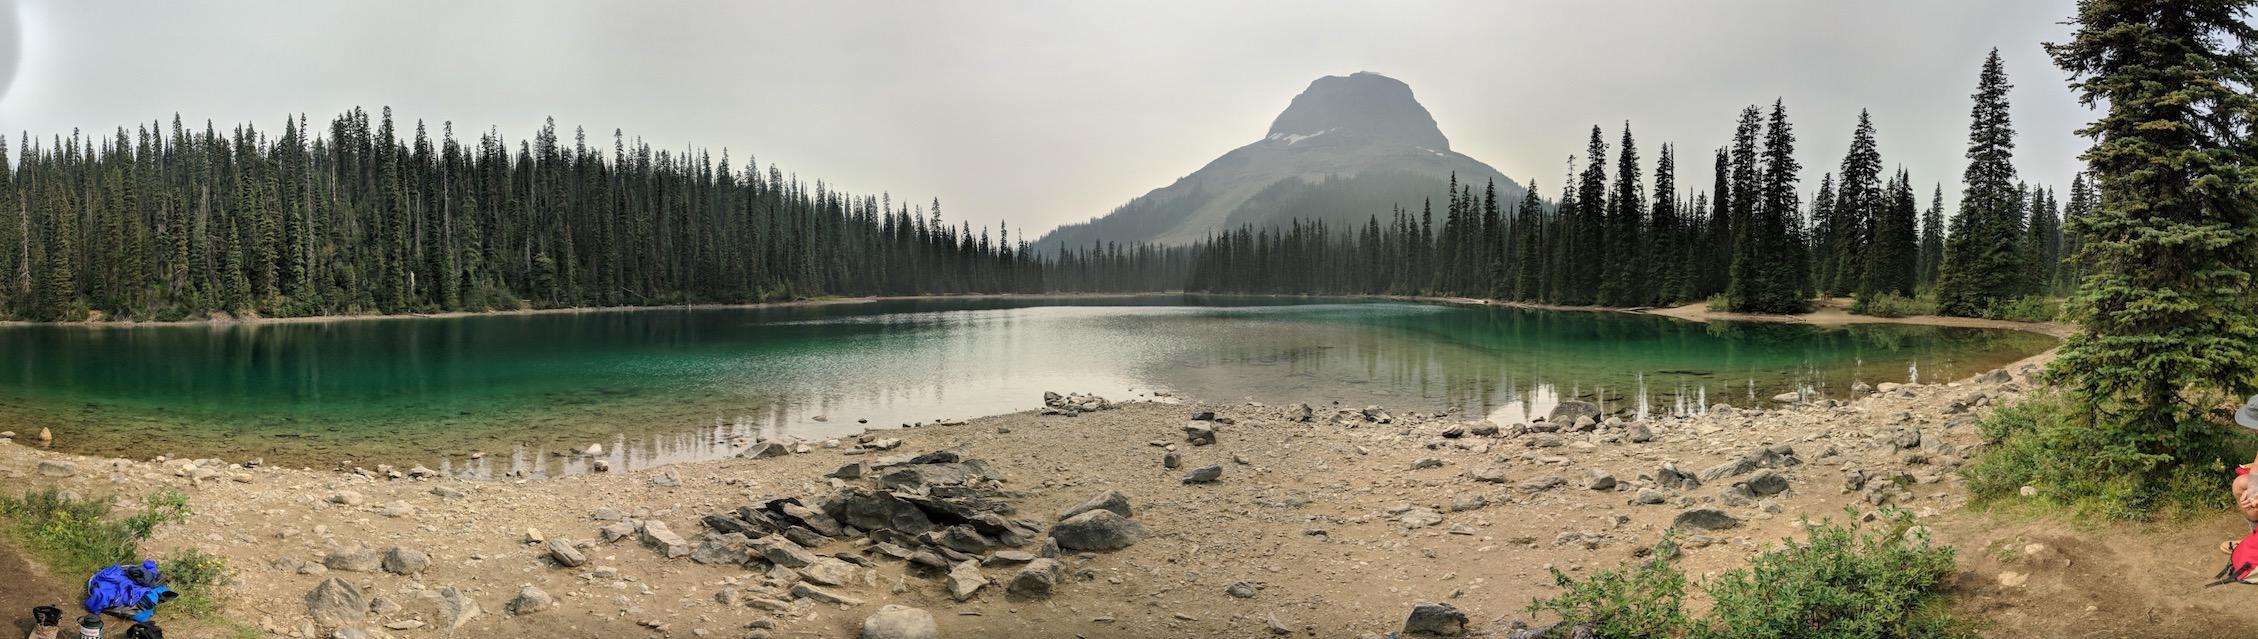 Yoho Lake - Emerald Lake Triangle